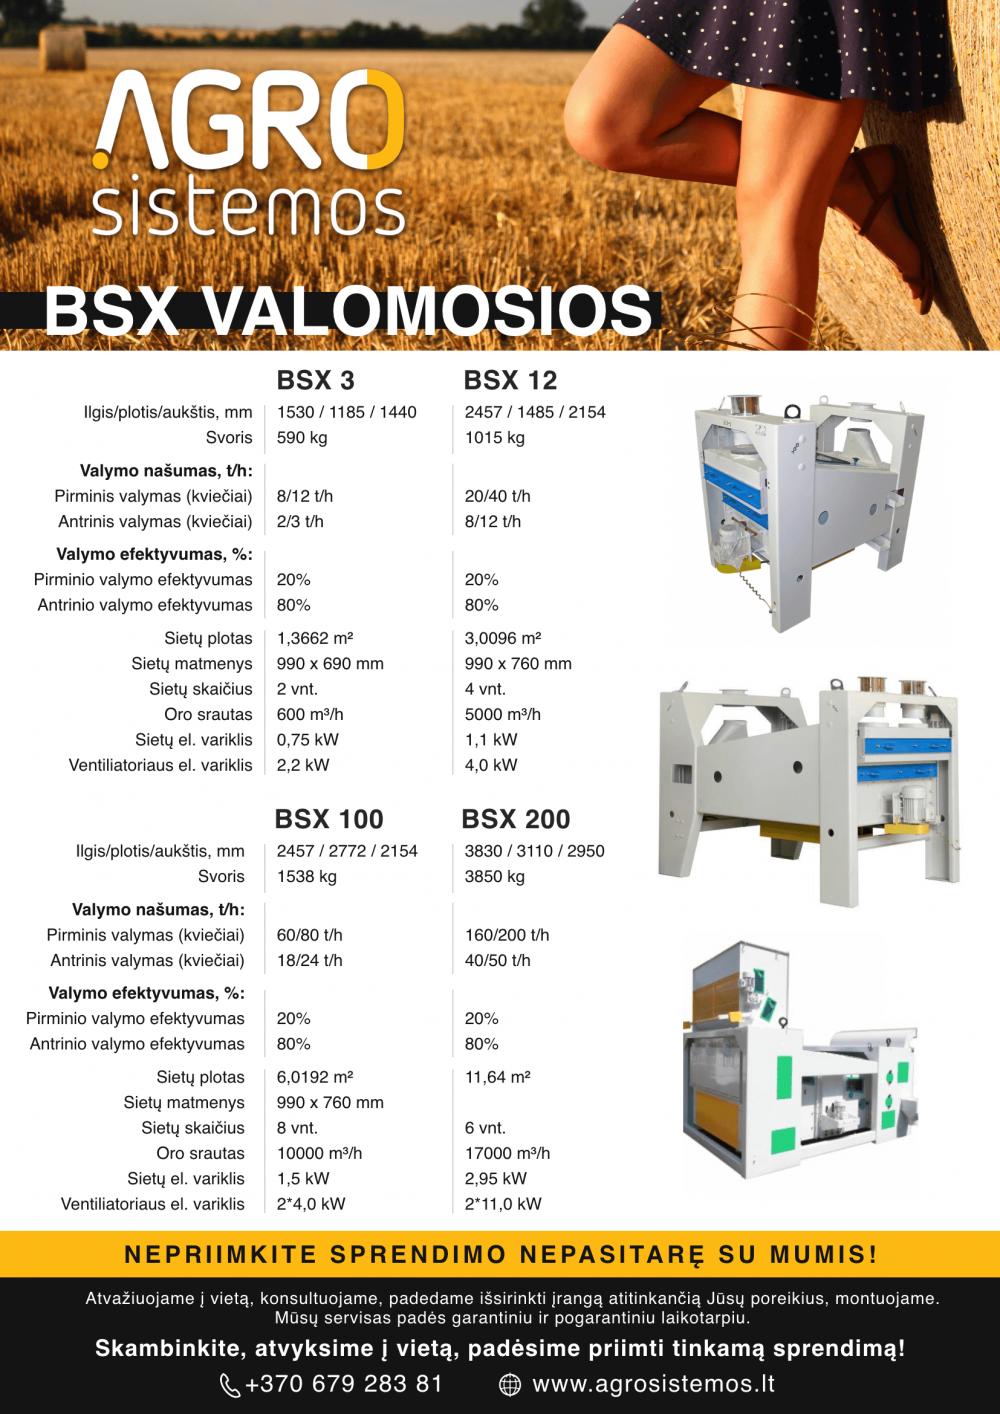 BSX valomosios